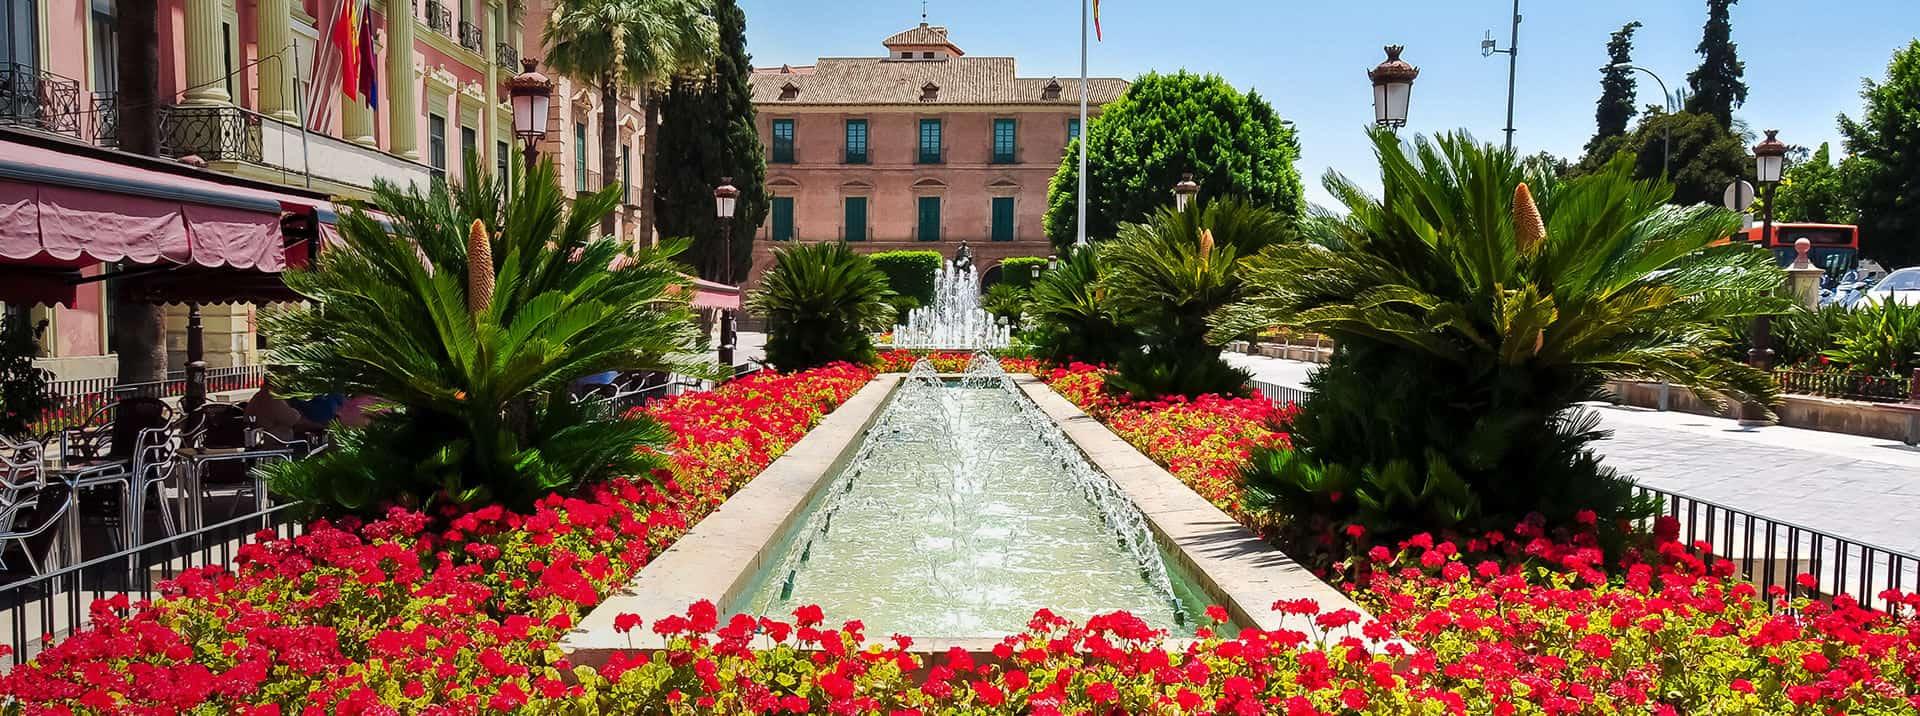 Featured-Image_Murcia_1920x716-min